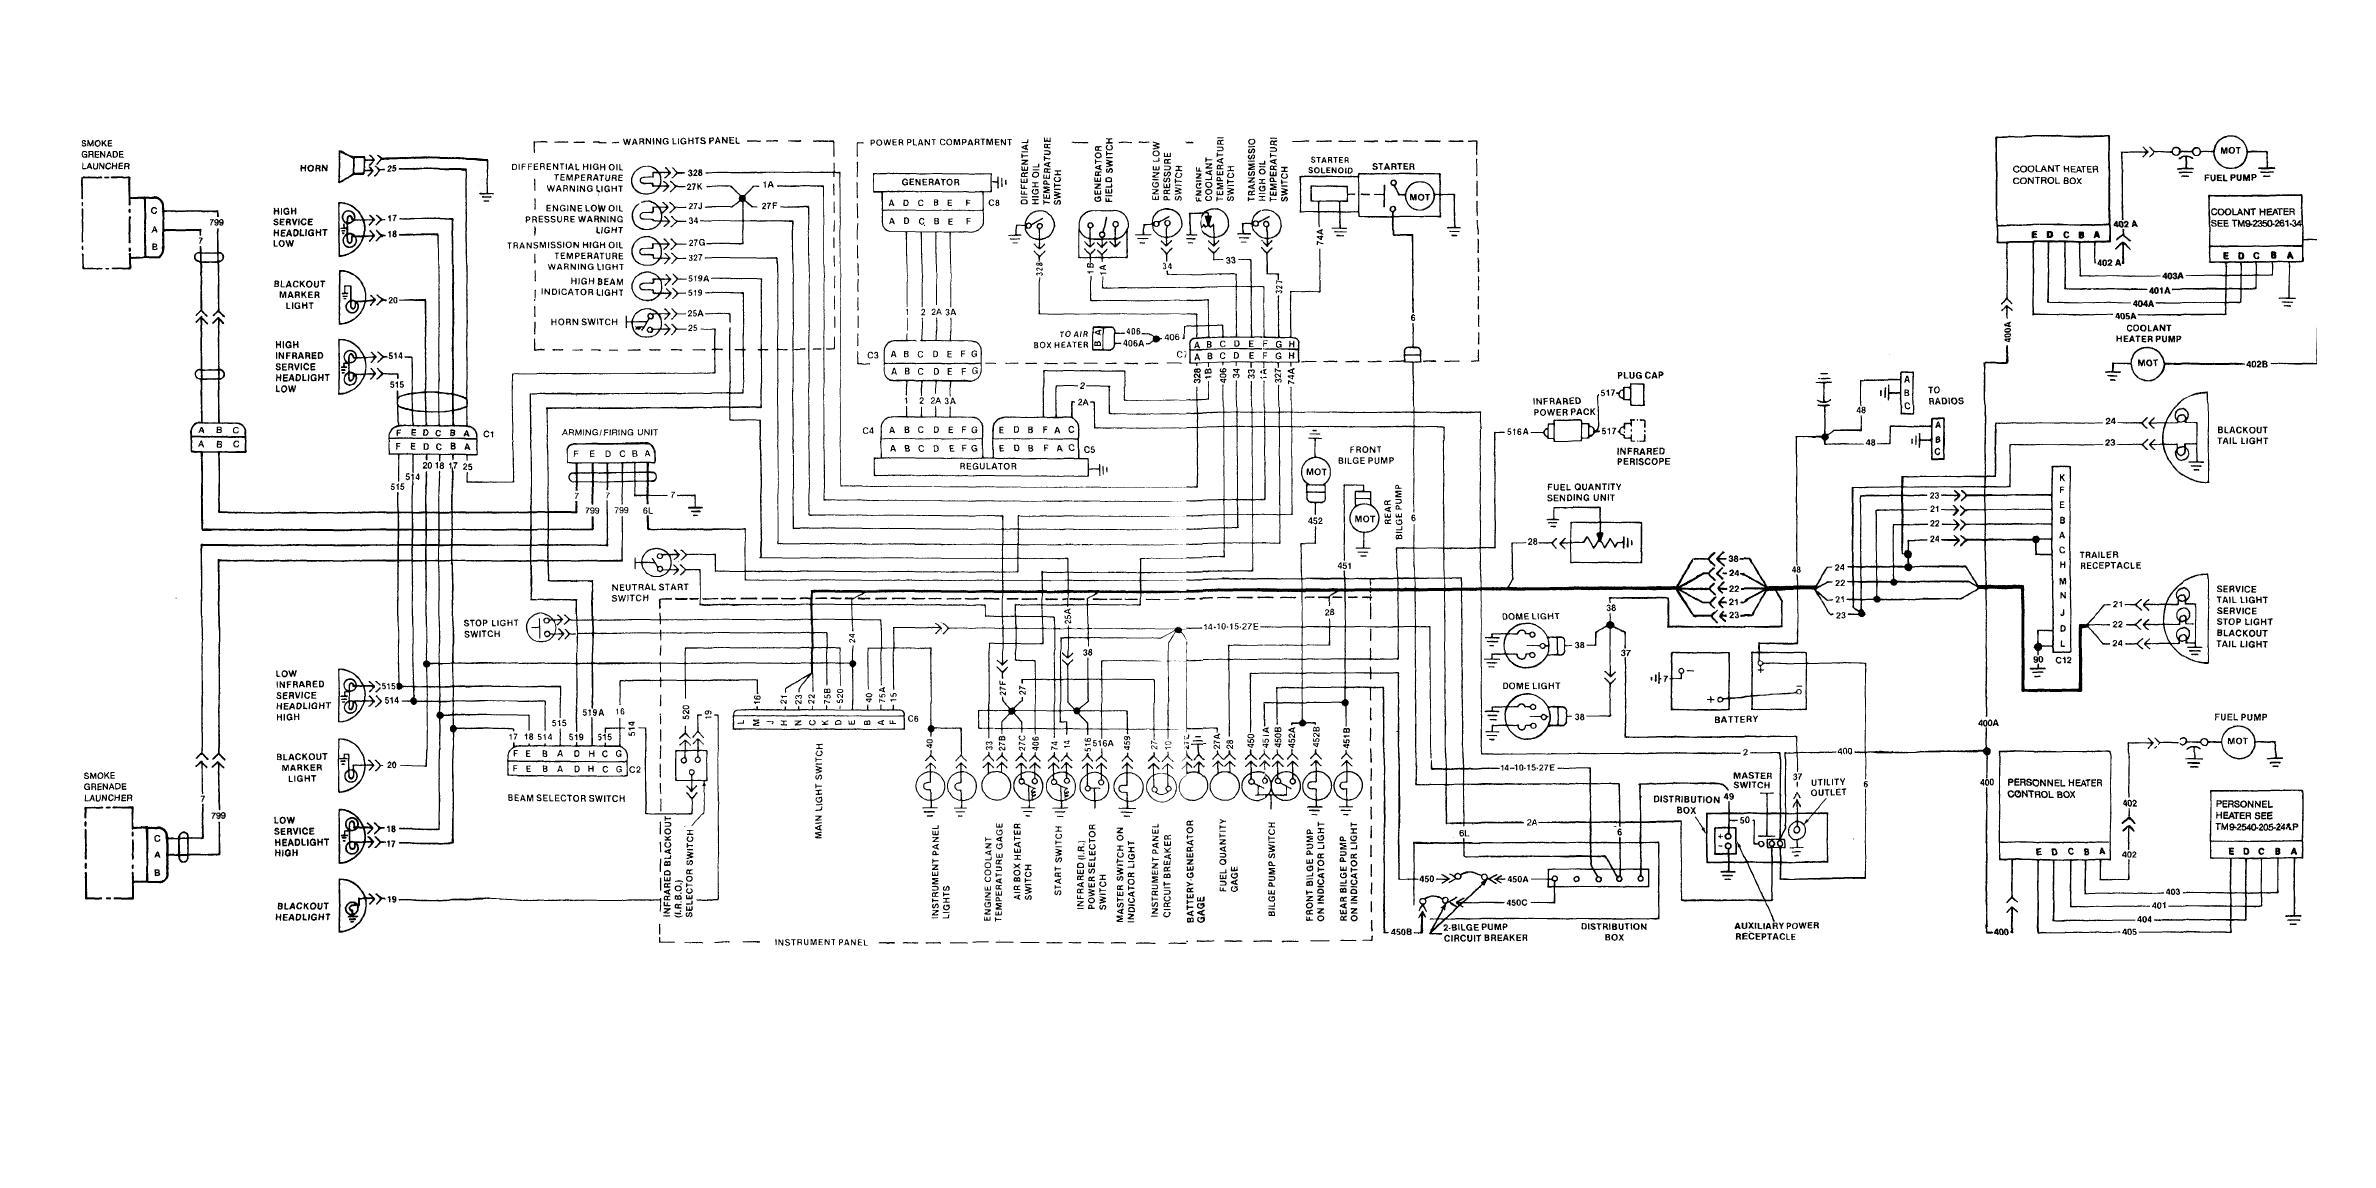 carrier 30ra 200 wiring diagram criminal procedure m113a2 electrical amp generator